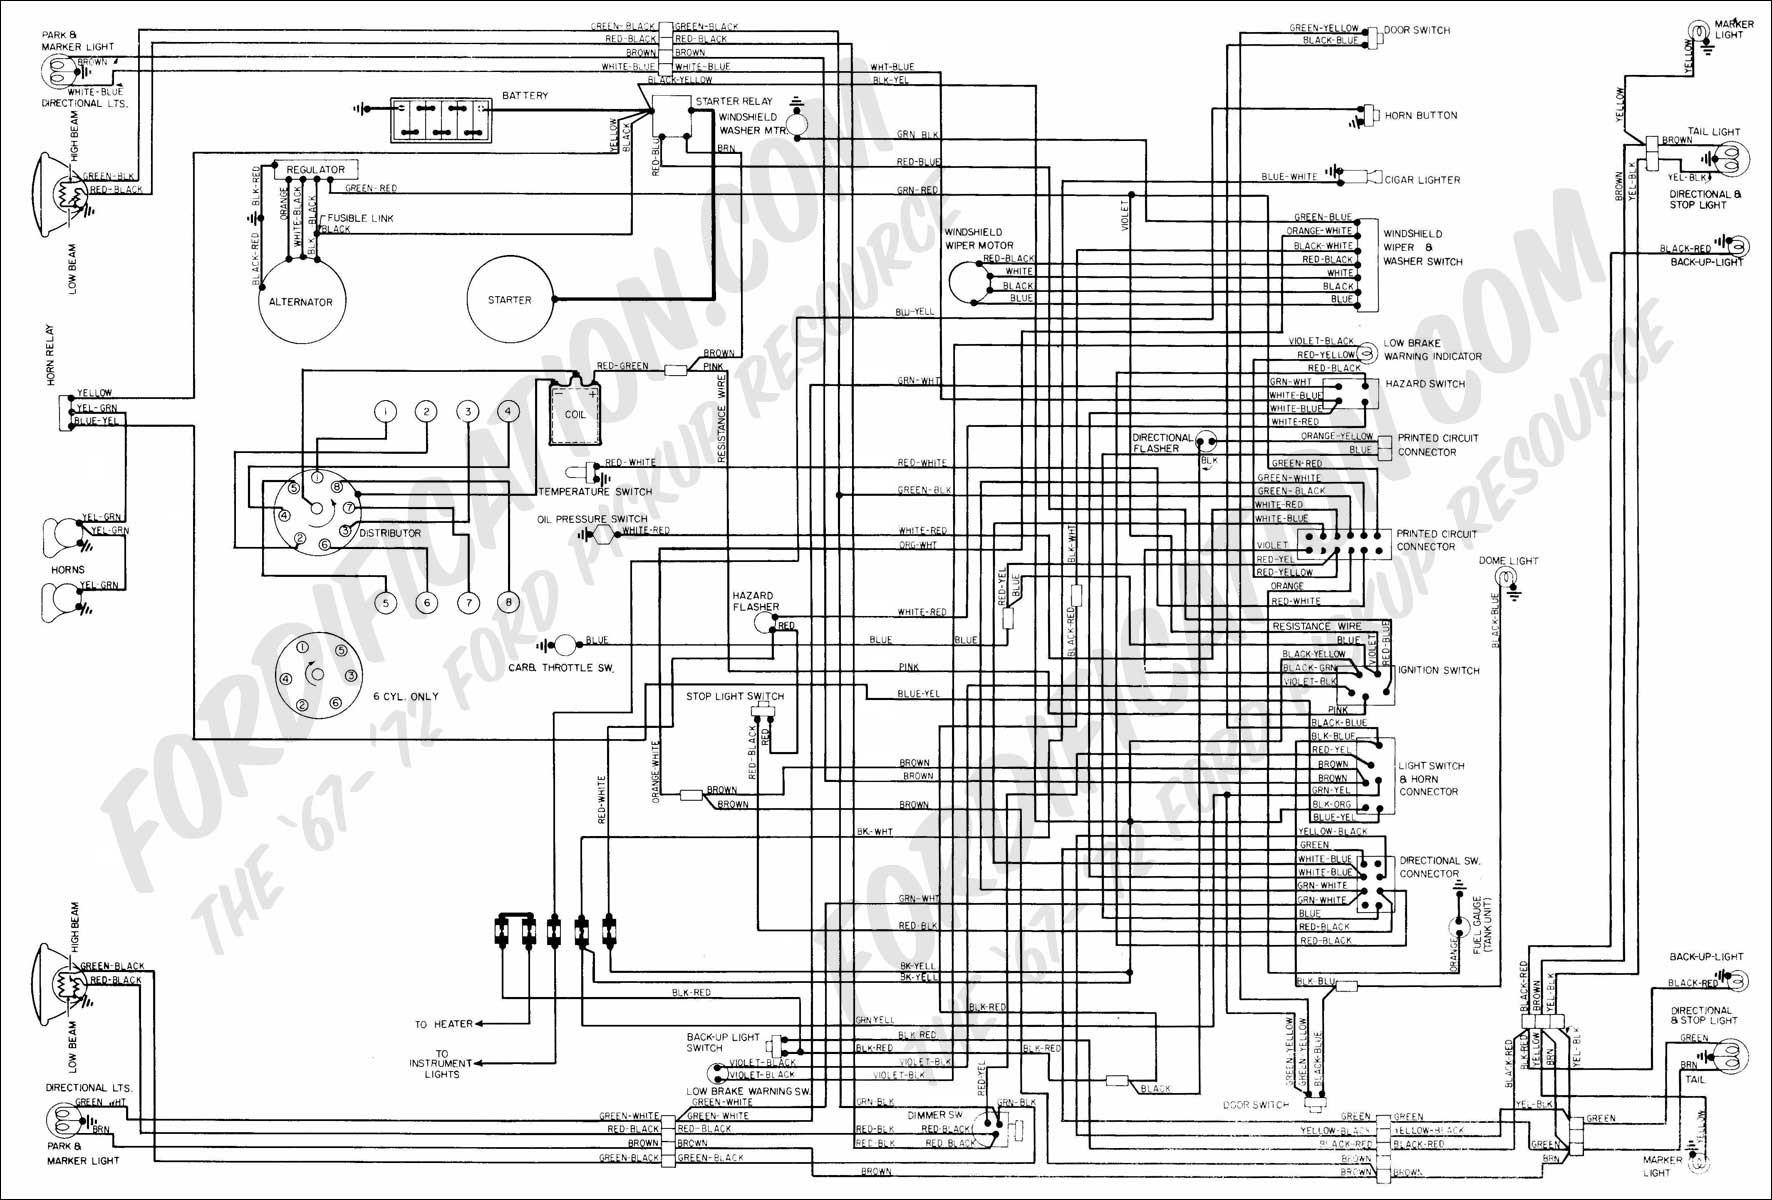 05 Kia Sedona Alternator Wiring